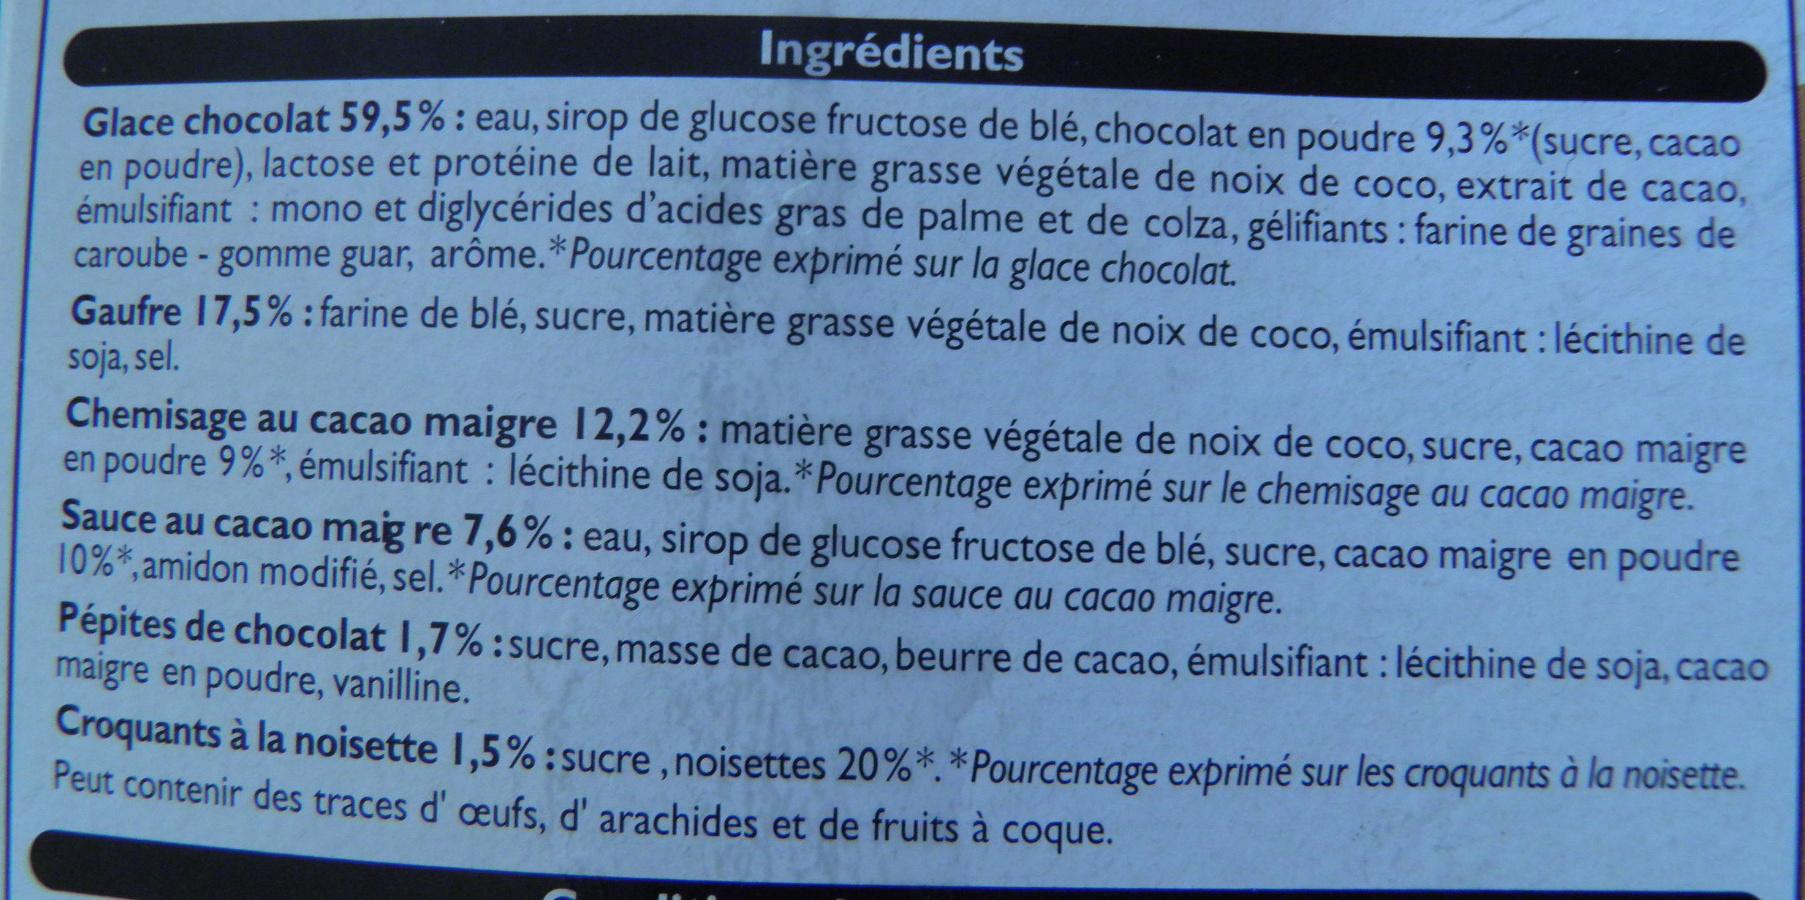 6 Cônes Chocolat - Ingrédients - fr